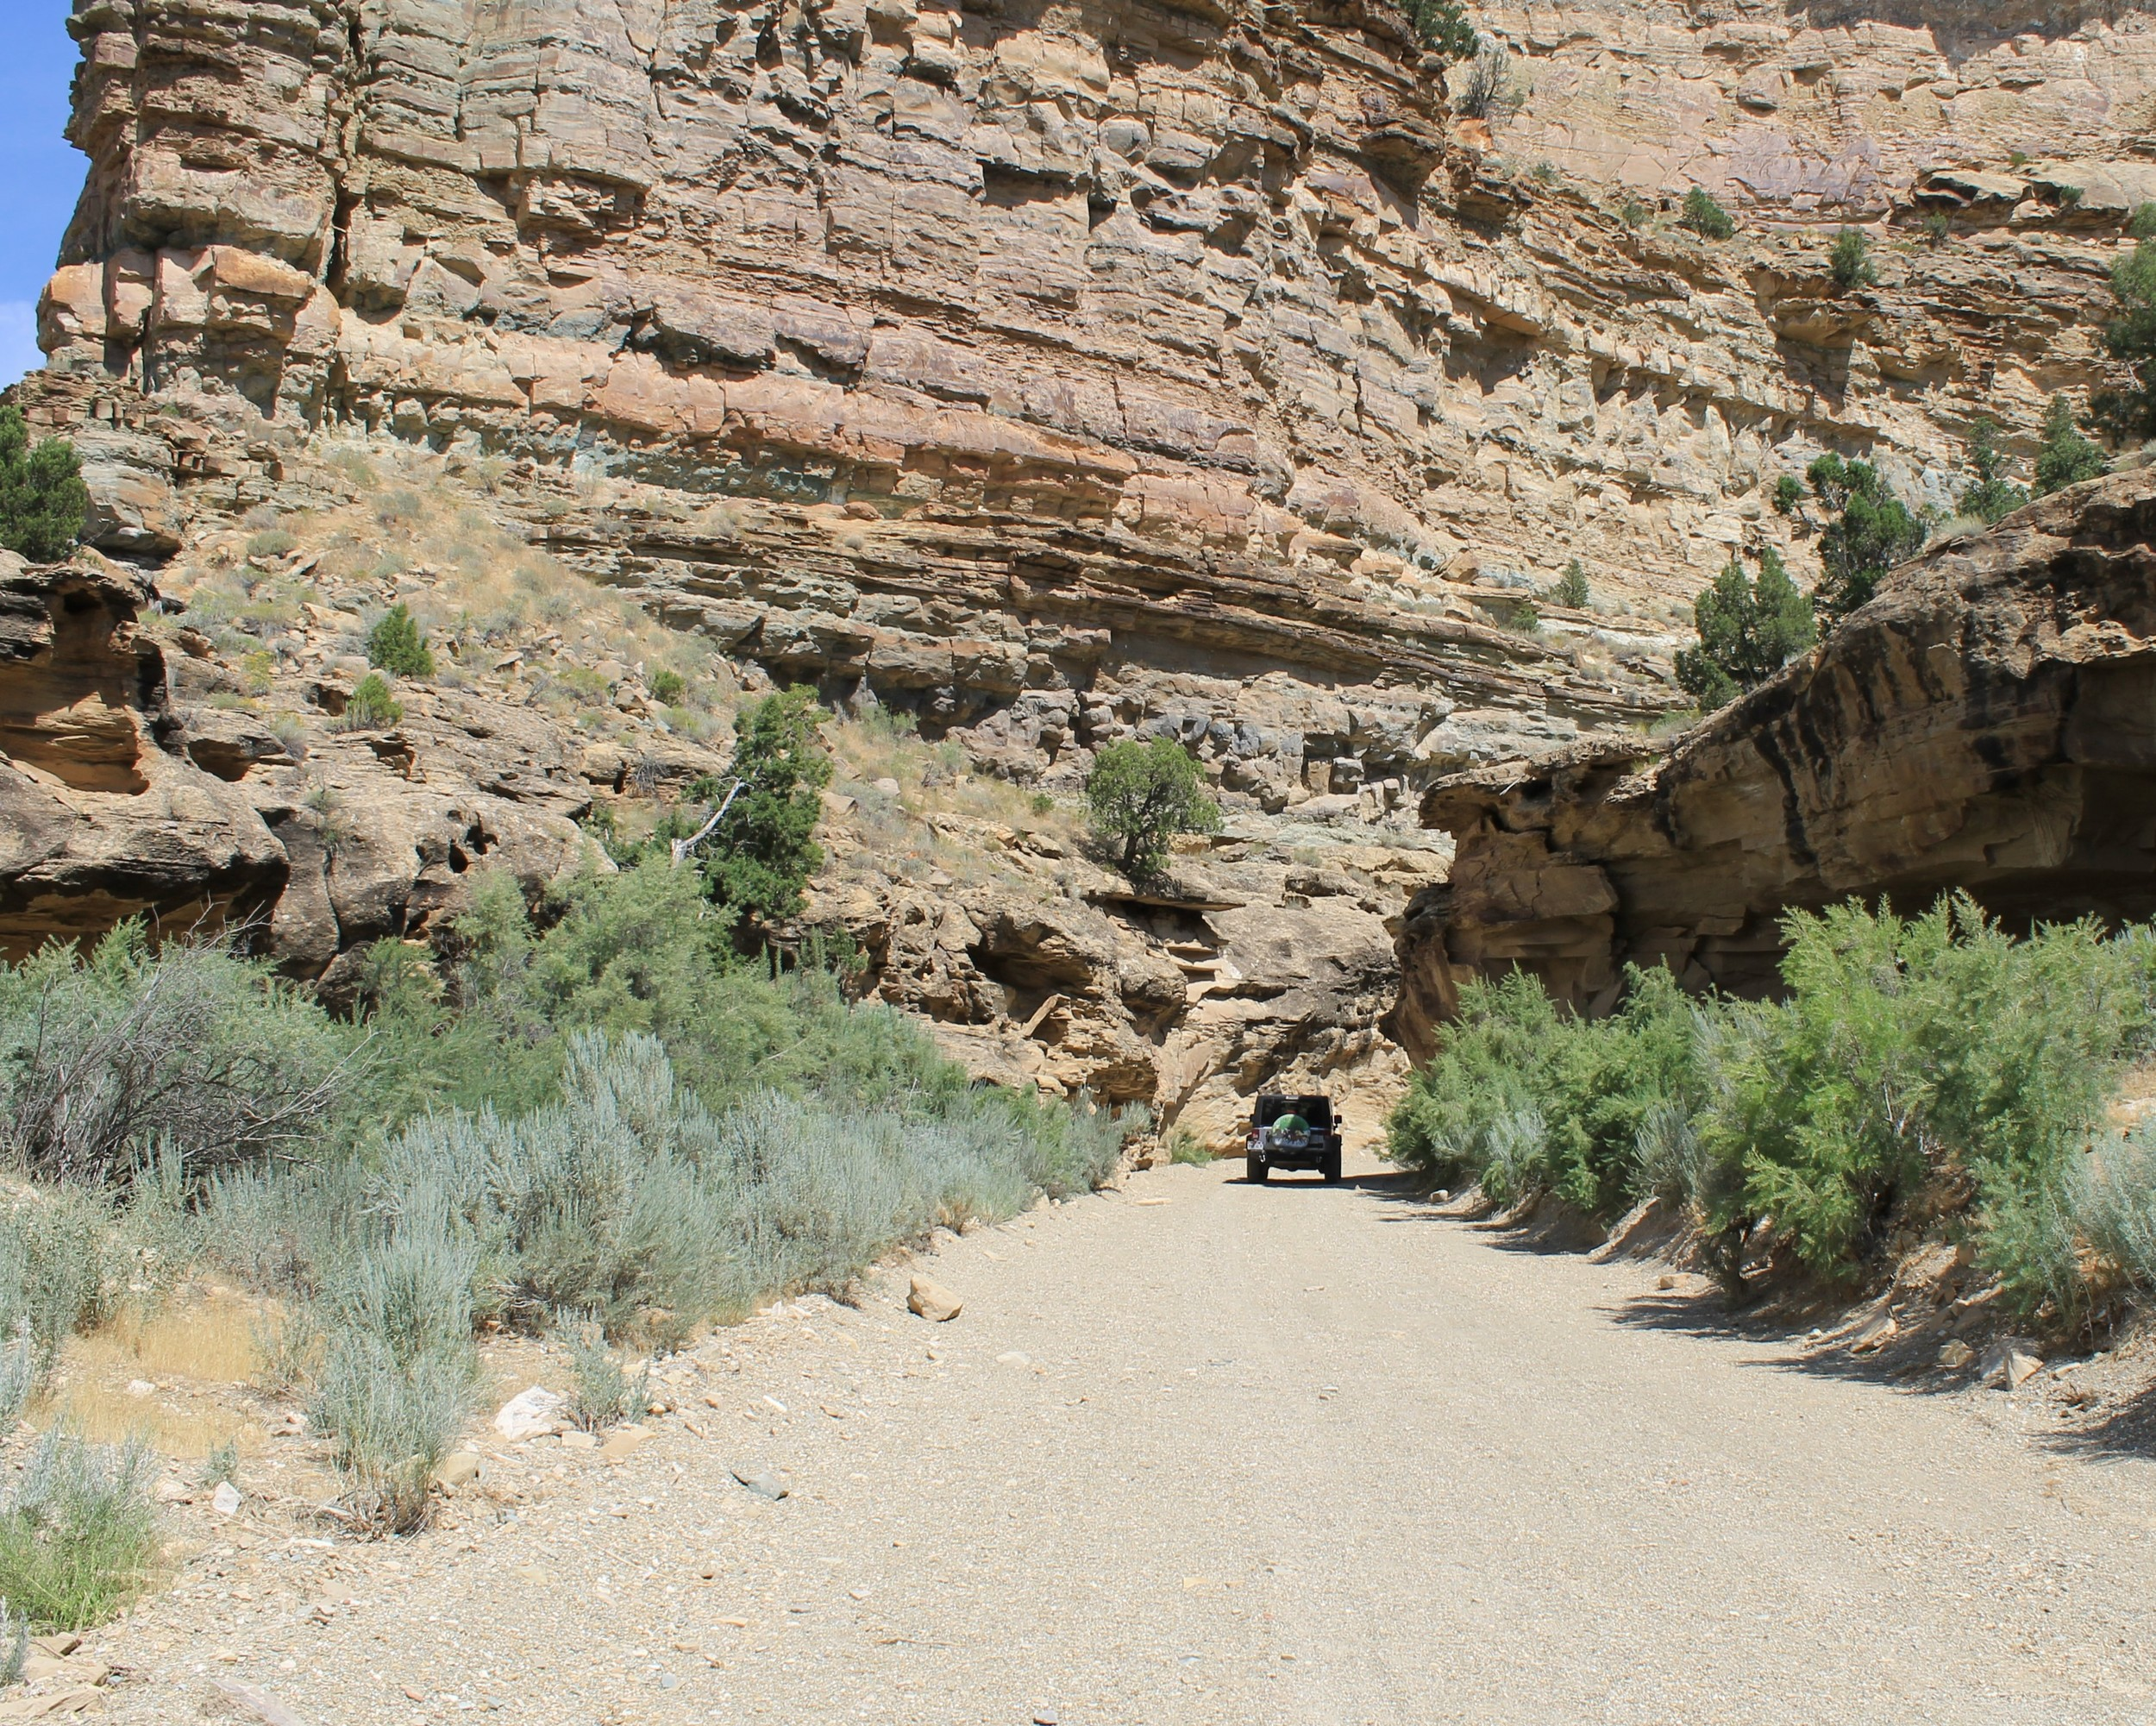 Entering Bull Canyon